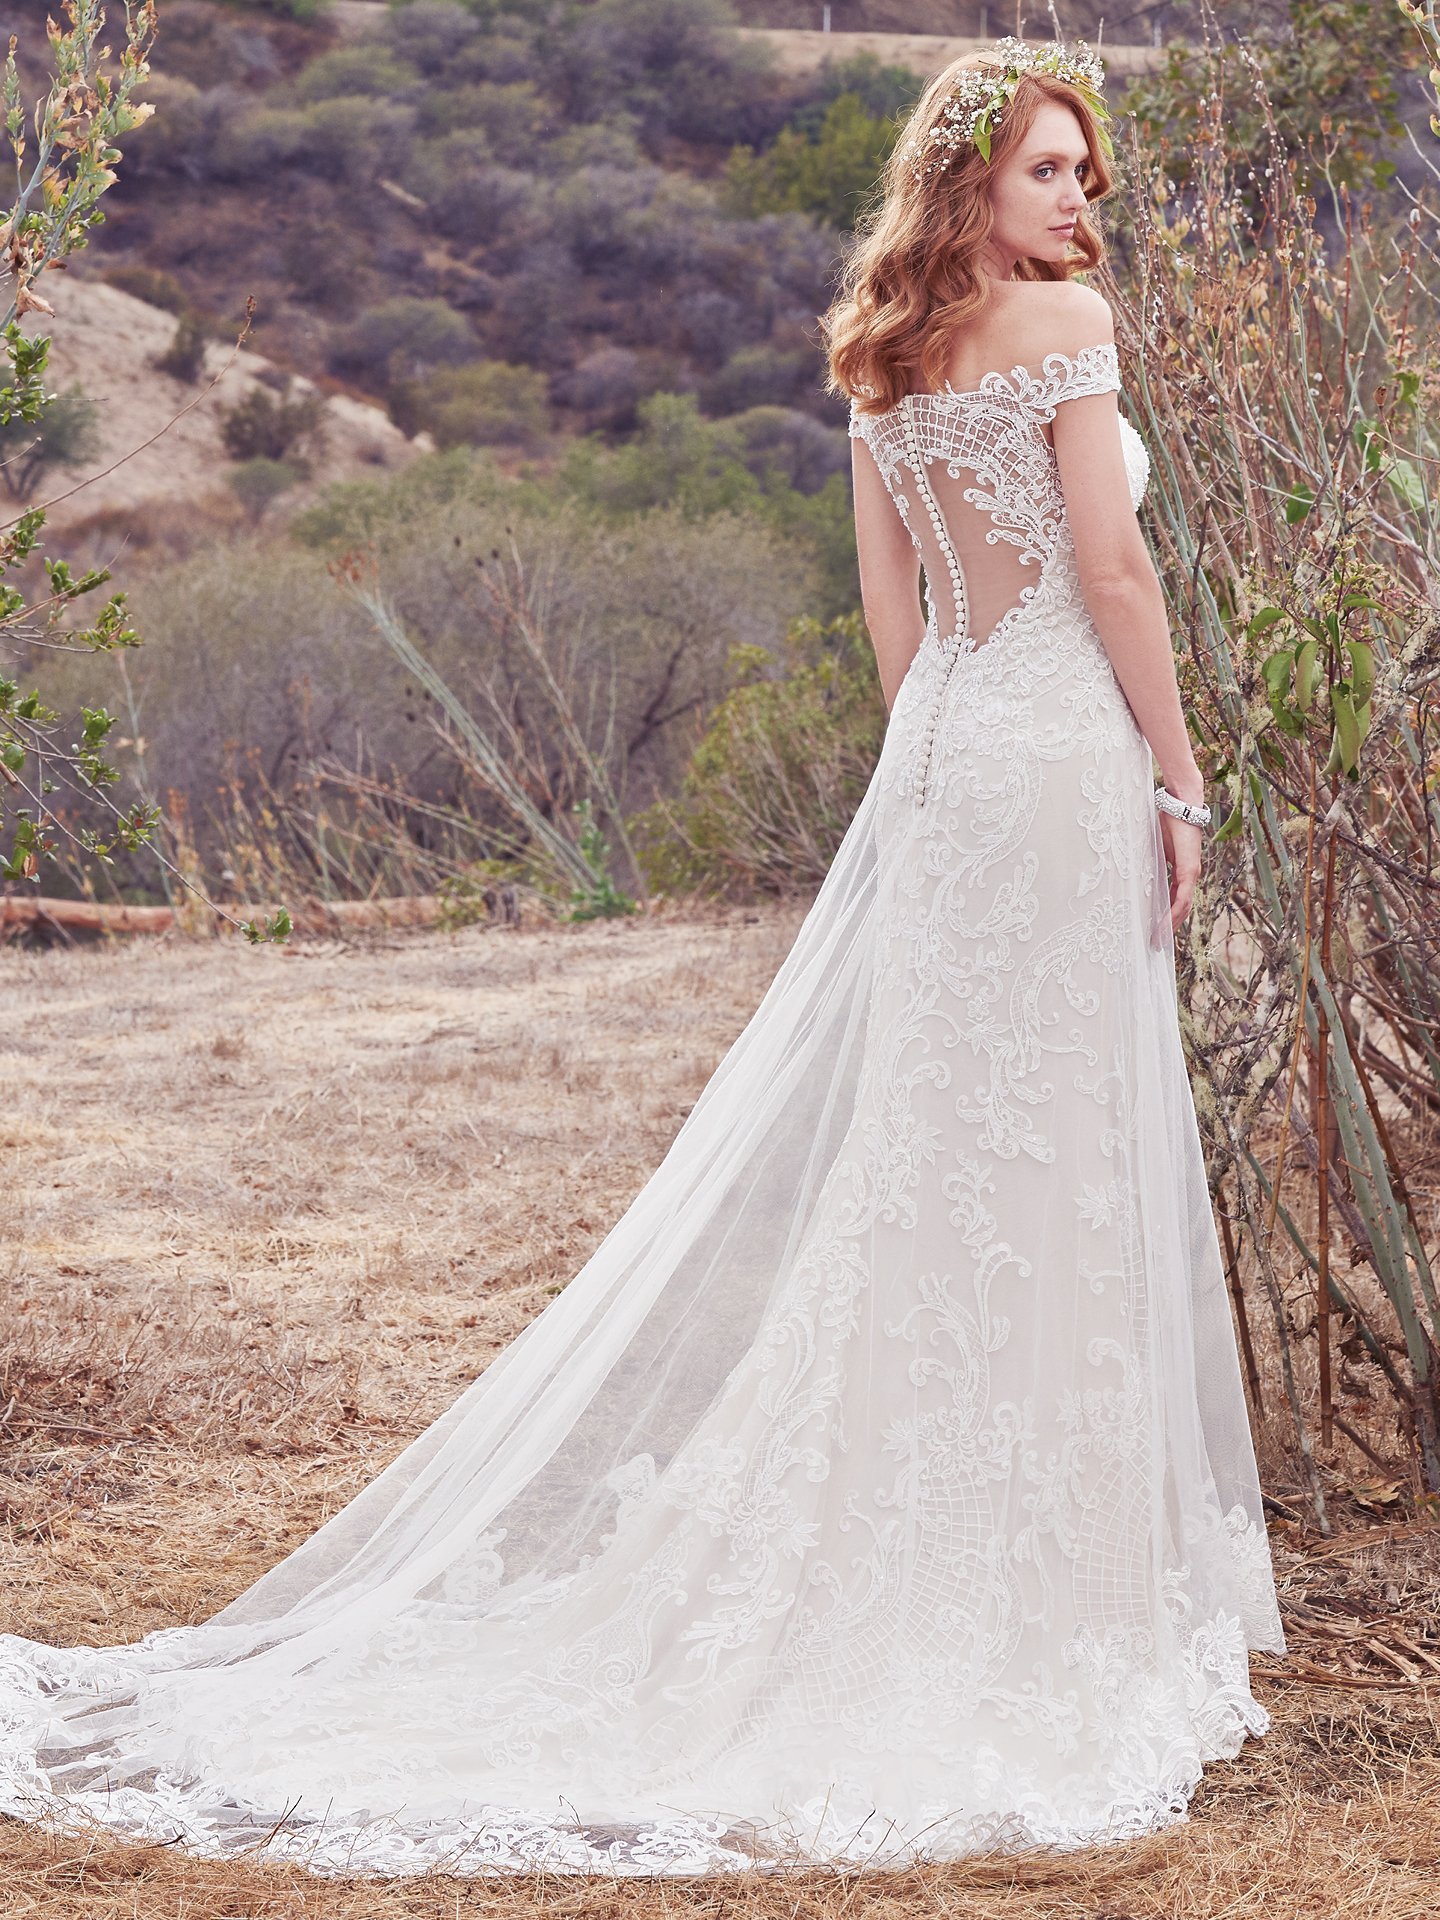 Maggie-Sottero-Wedding-Dress-Daisy-7MT904-Back.jpg